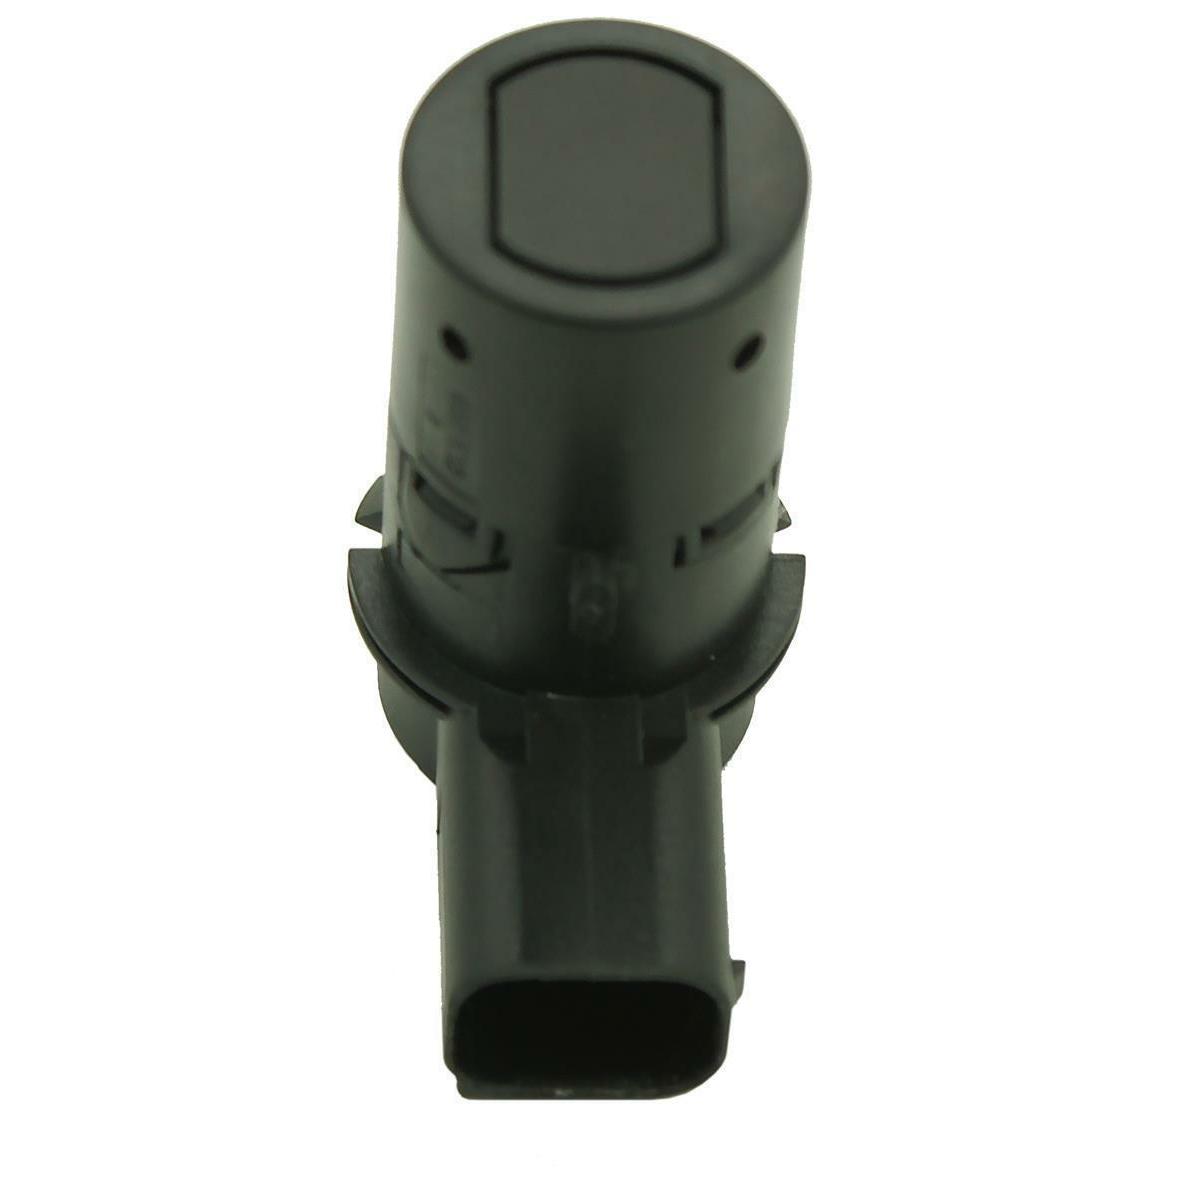 Parksensor 25994-ZF10A for Nissan PDC Parktronic